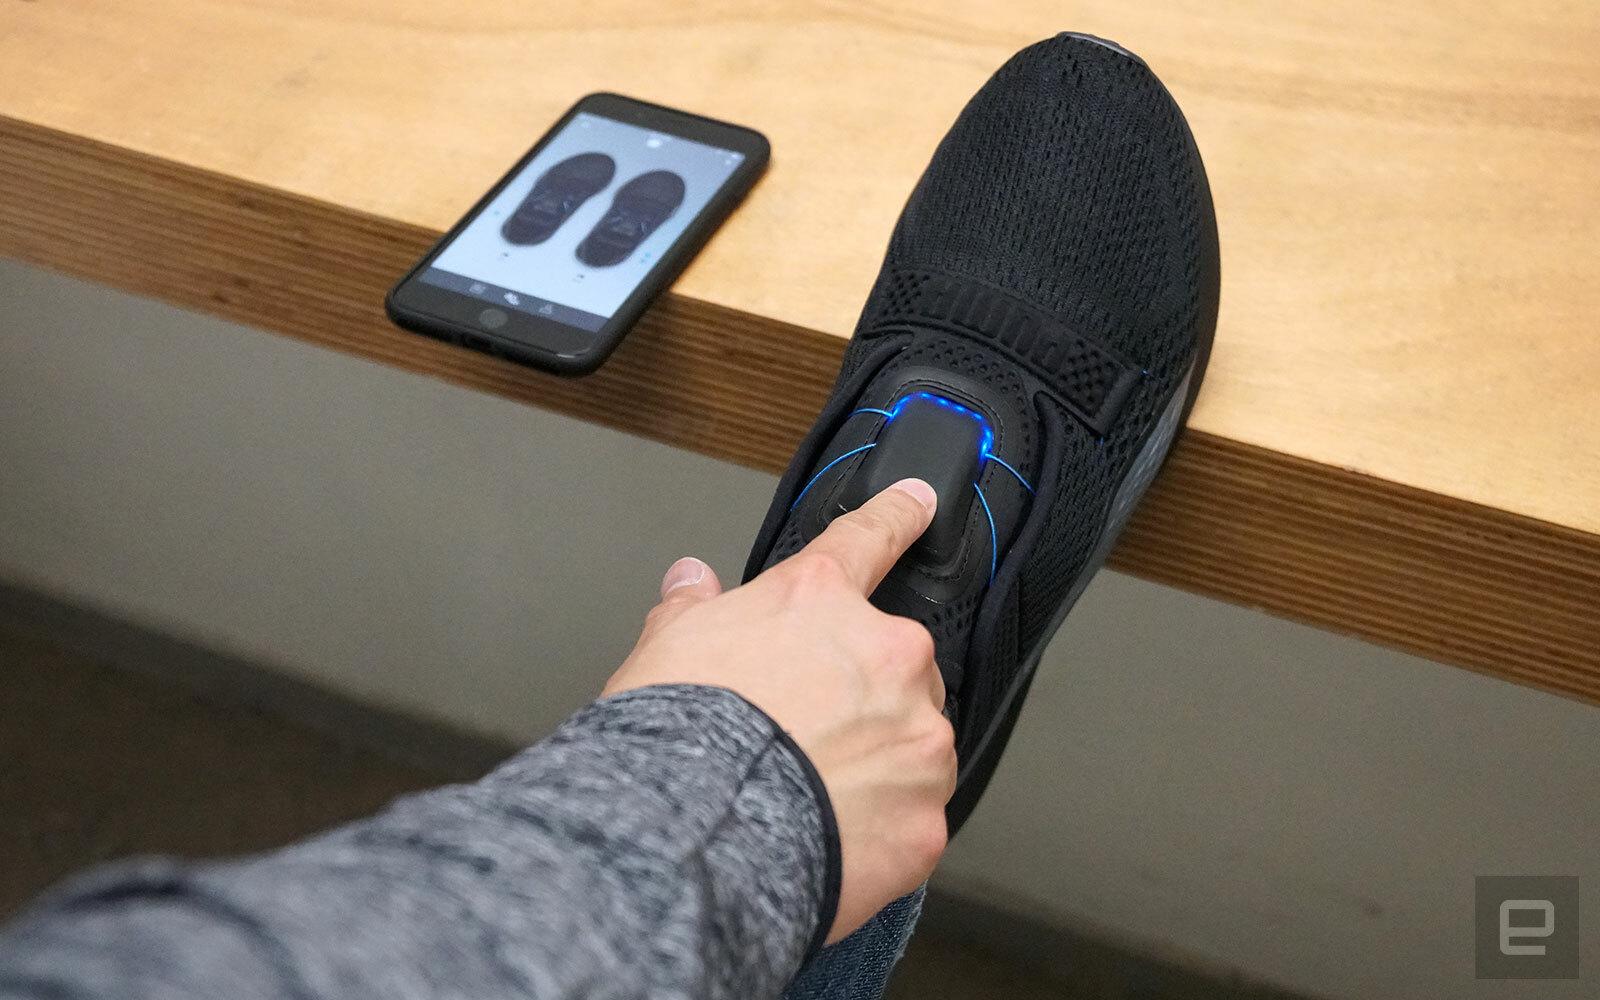 ce999351fd7062 puma-fi-self-lacing-shoes-3 - FunkyKit